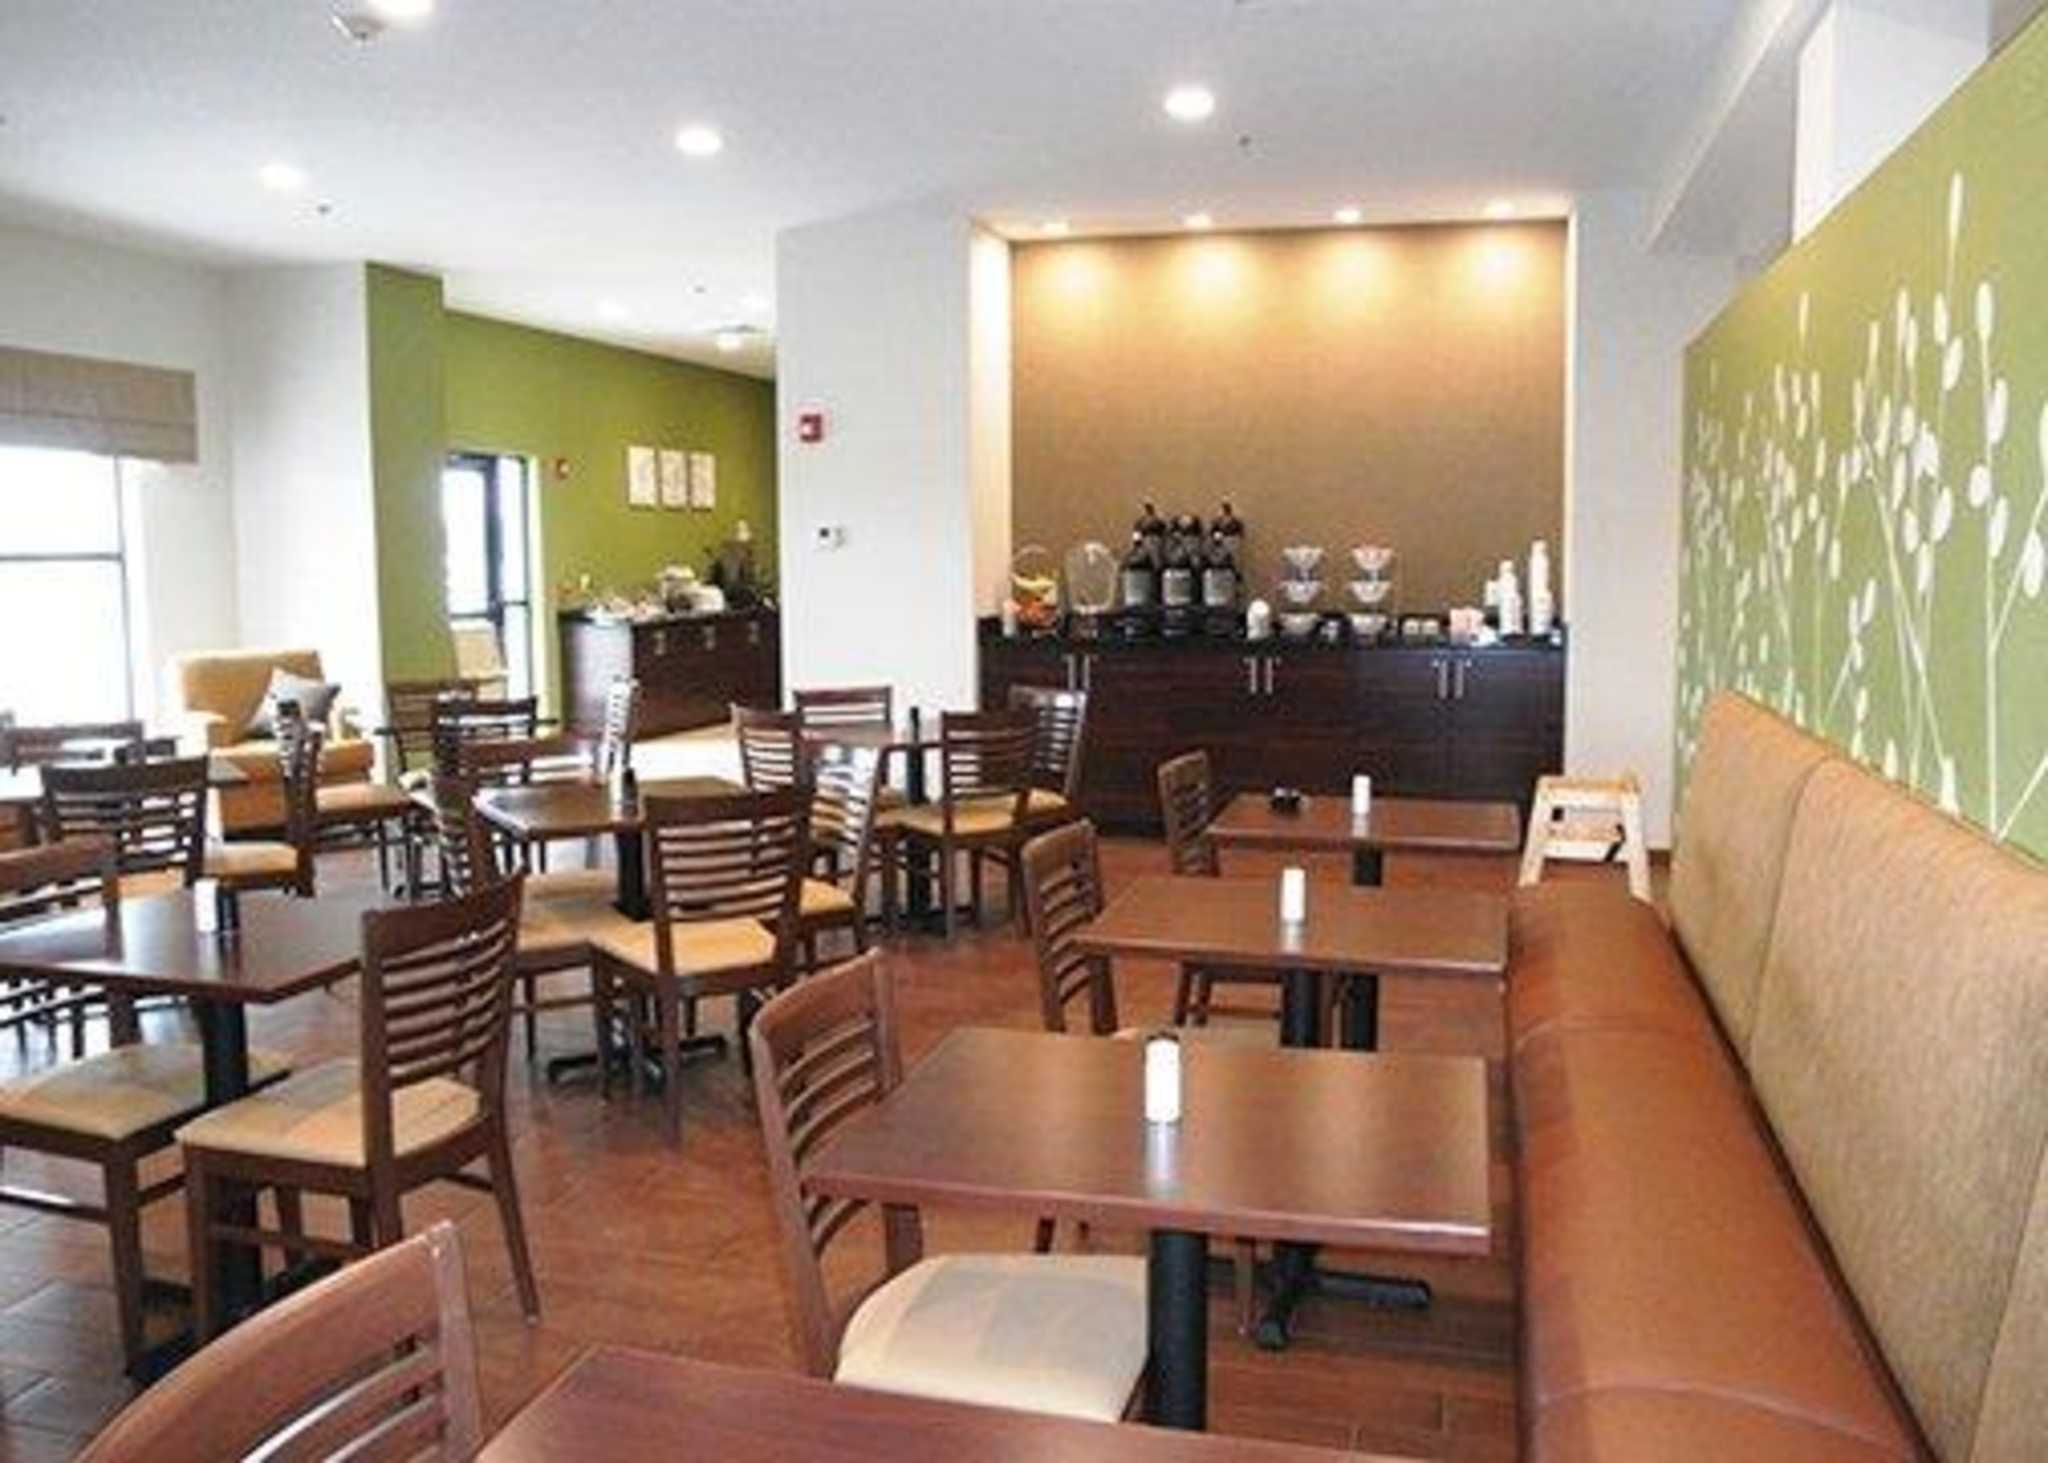 Sleep Inn & Suites Belmont / St. Clairsville image 5